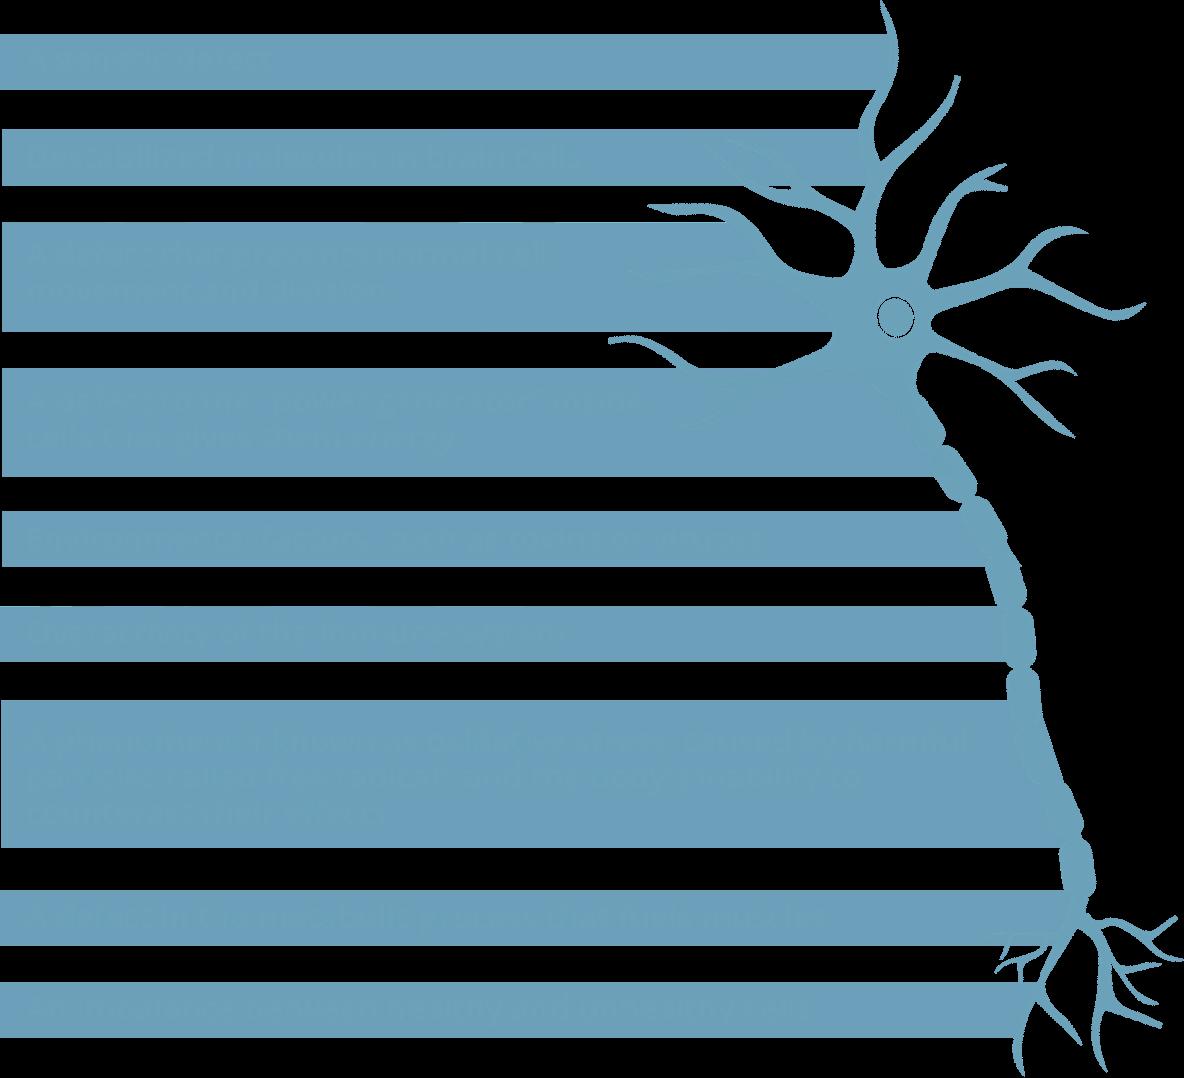 Factors contributing to motor neuron loss